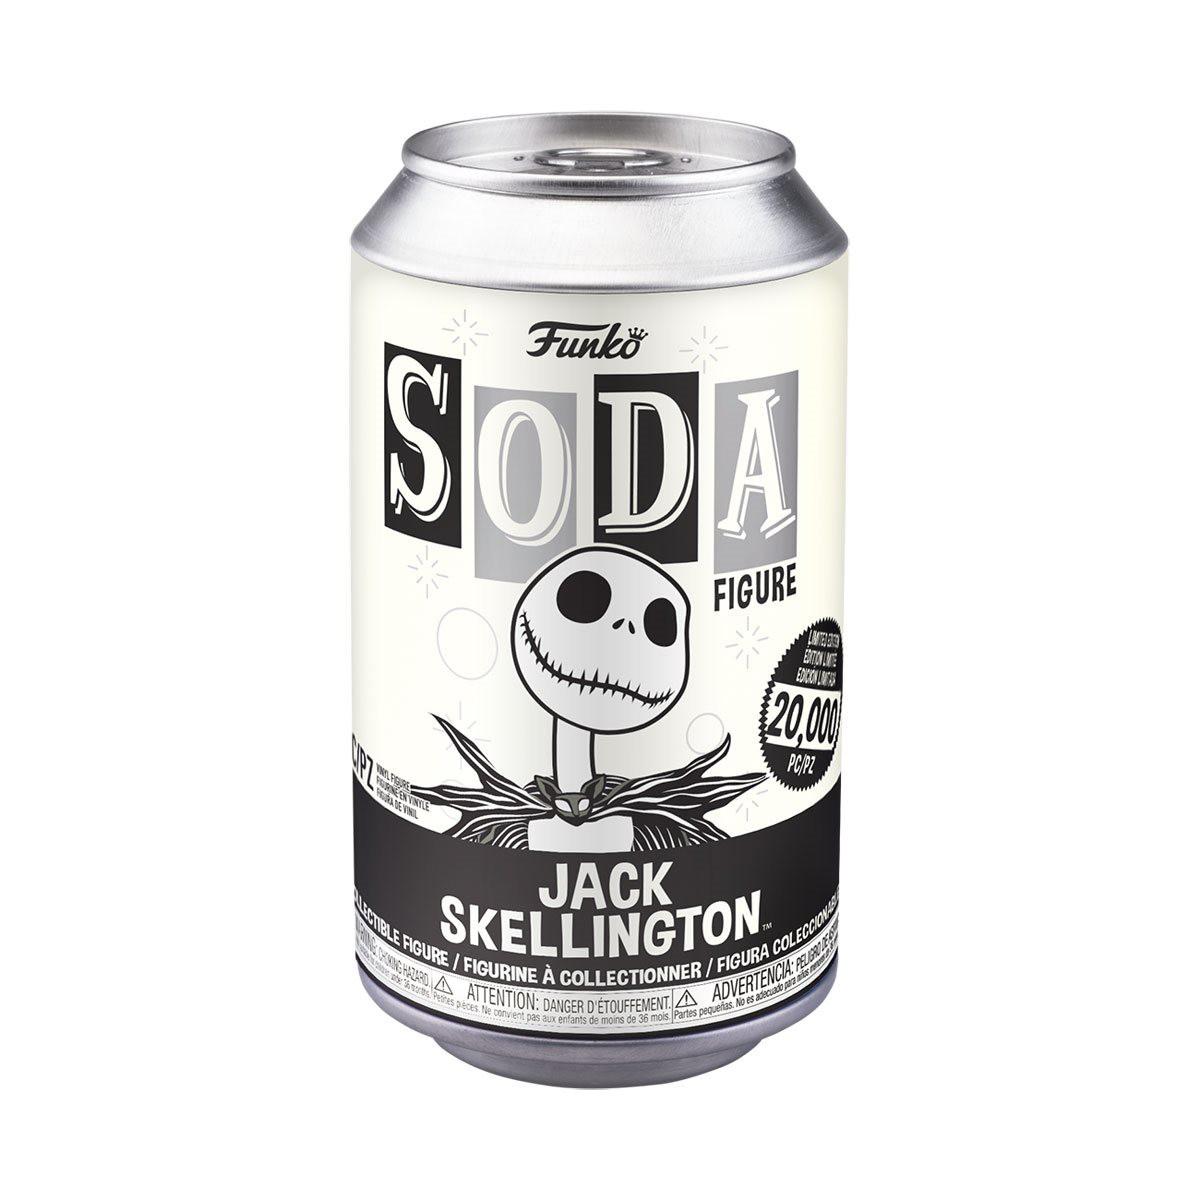 PRÉ VENDA: Lata Pop! Jack Skellington: The Nightmare Before Christmas Vinyl Soda: ( Edição Limitada) - Funko